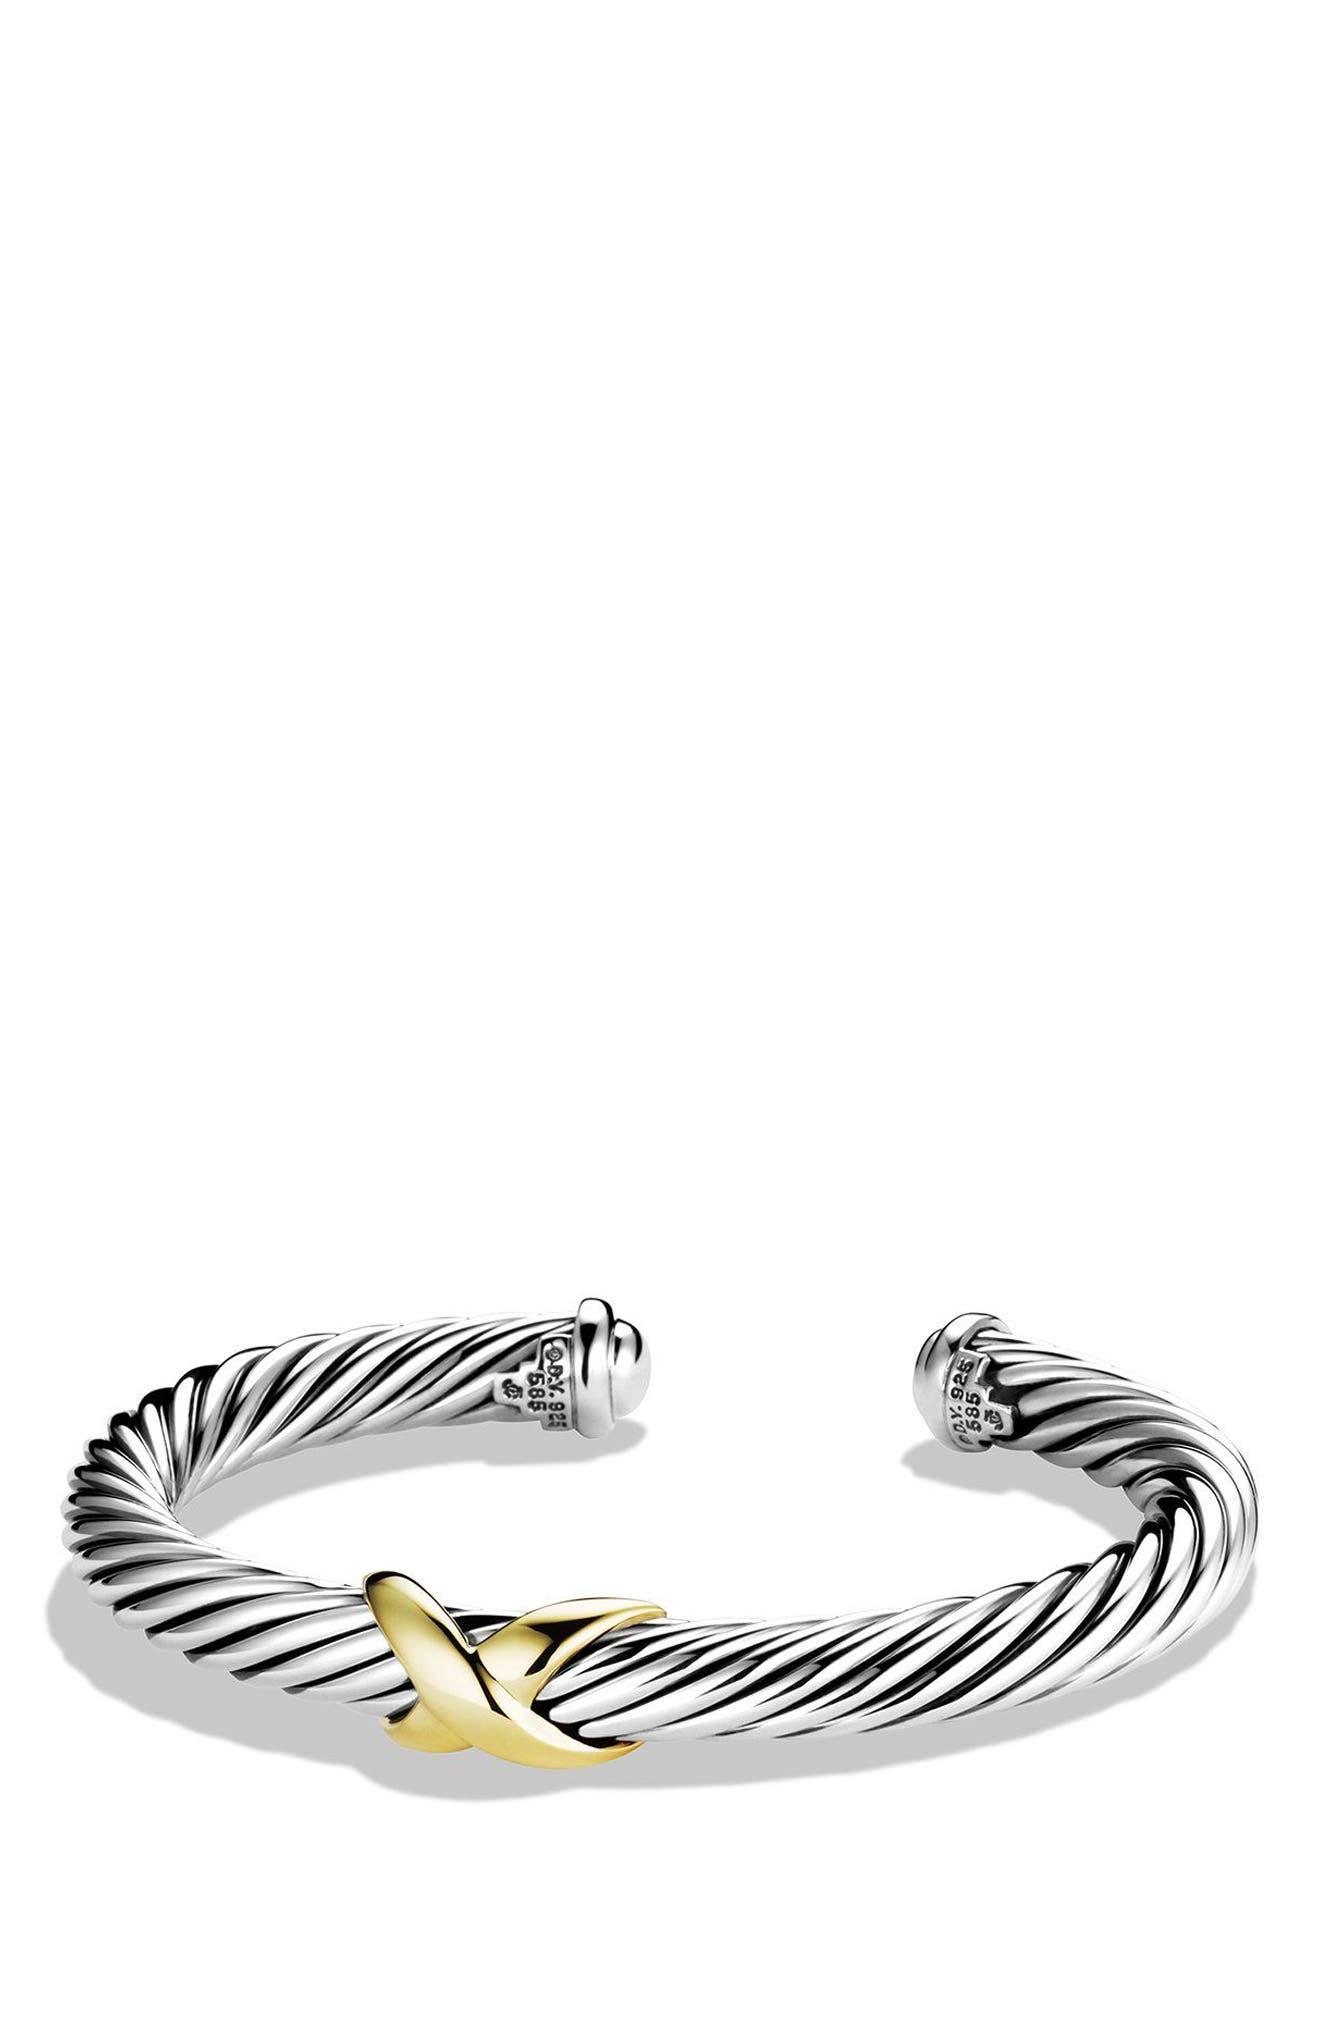 Main Image - David Yurman X Bracelet with 14K Gold